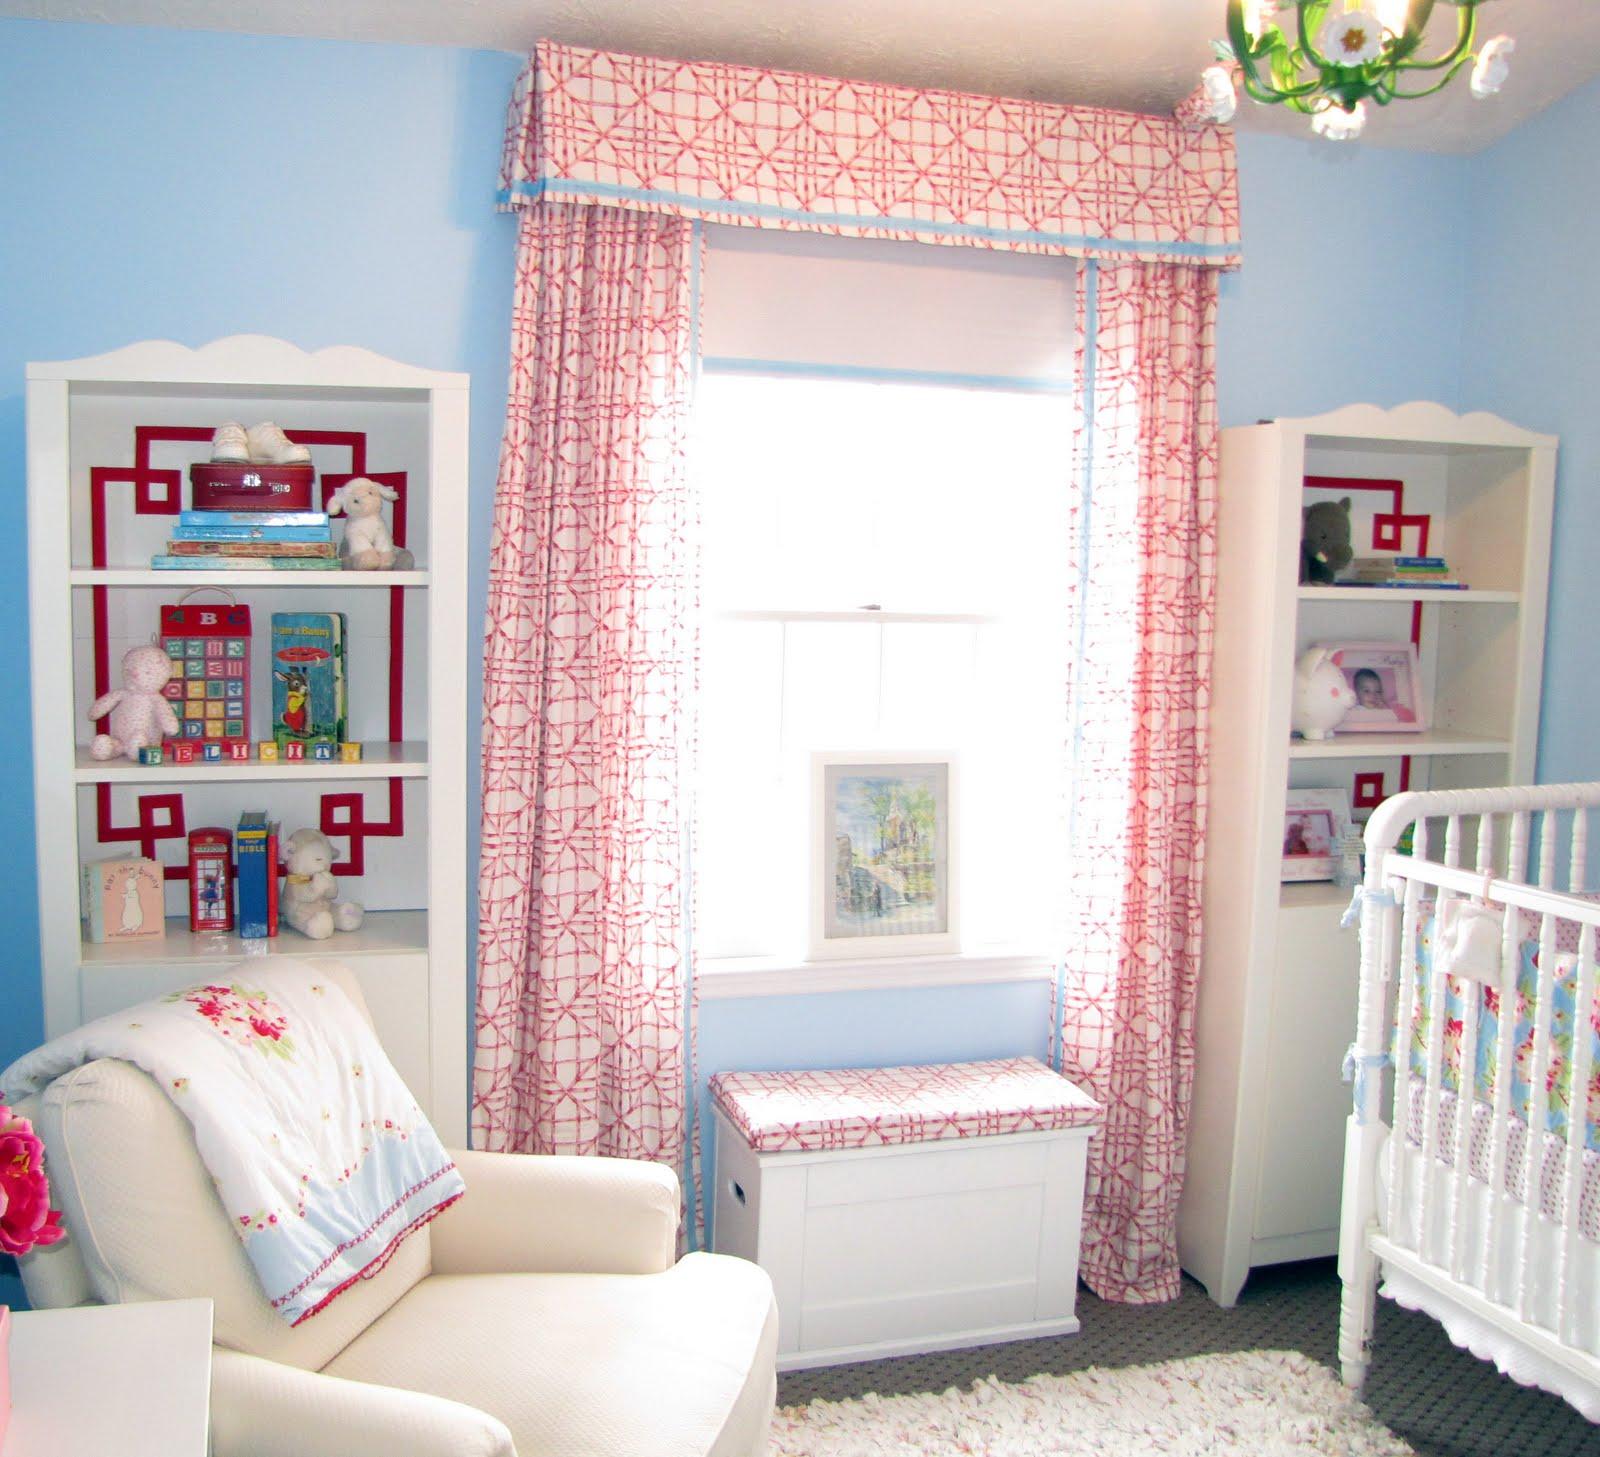 bibbidi bobbidi beautiful diy drapes and valance from sheets. Black Bedroom Furniture Sets. Home Design Ideas